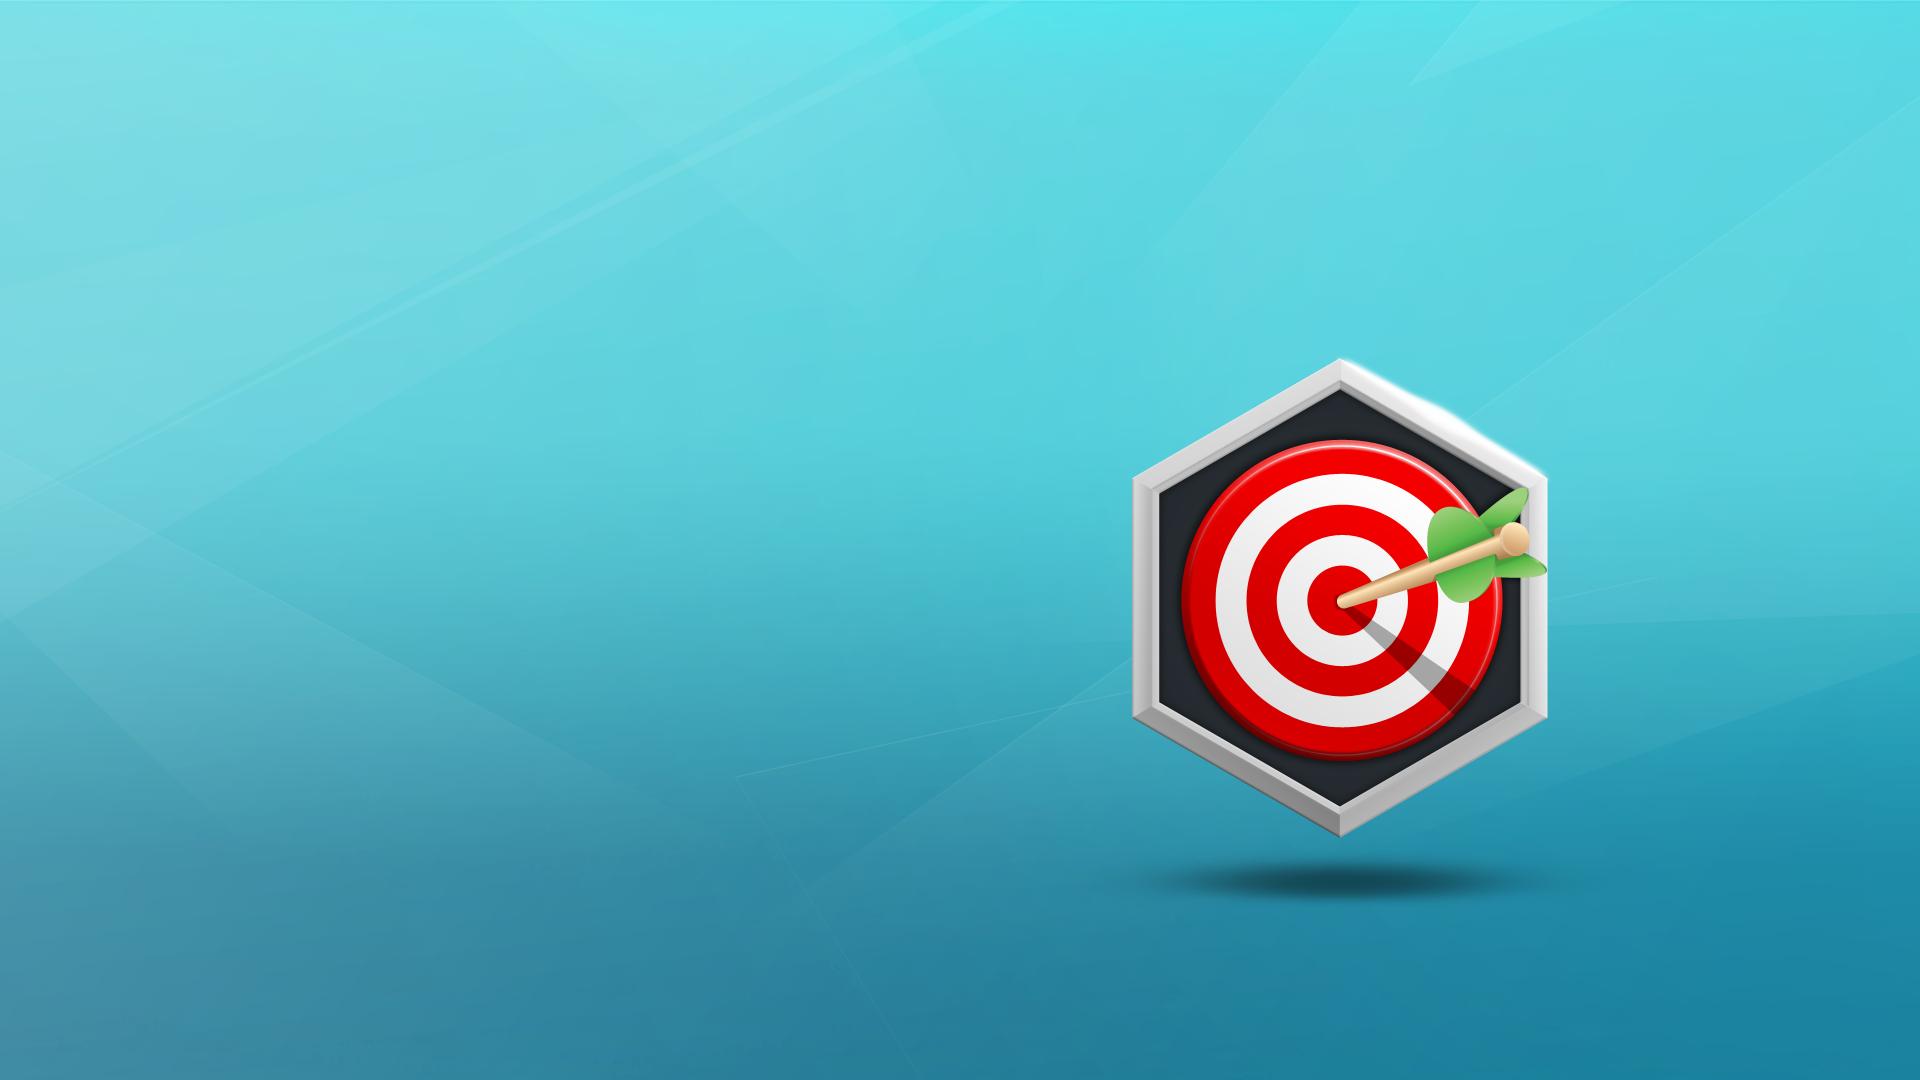 Icon for Take aim